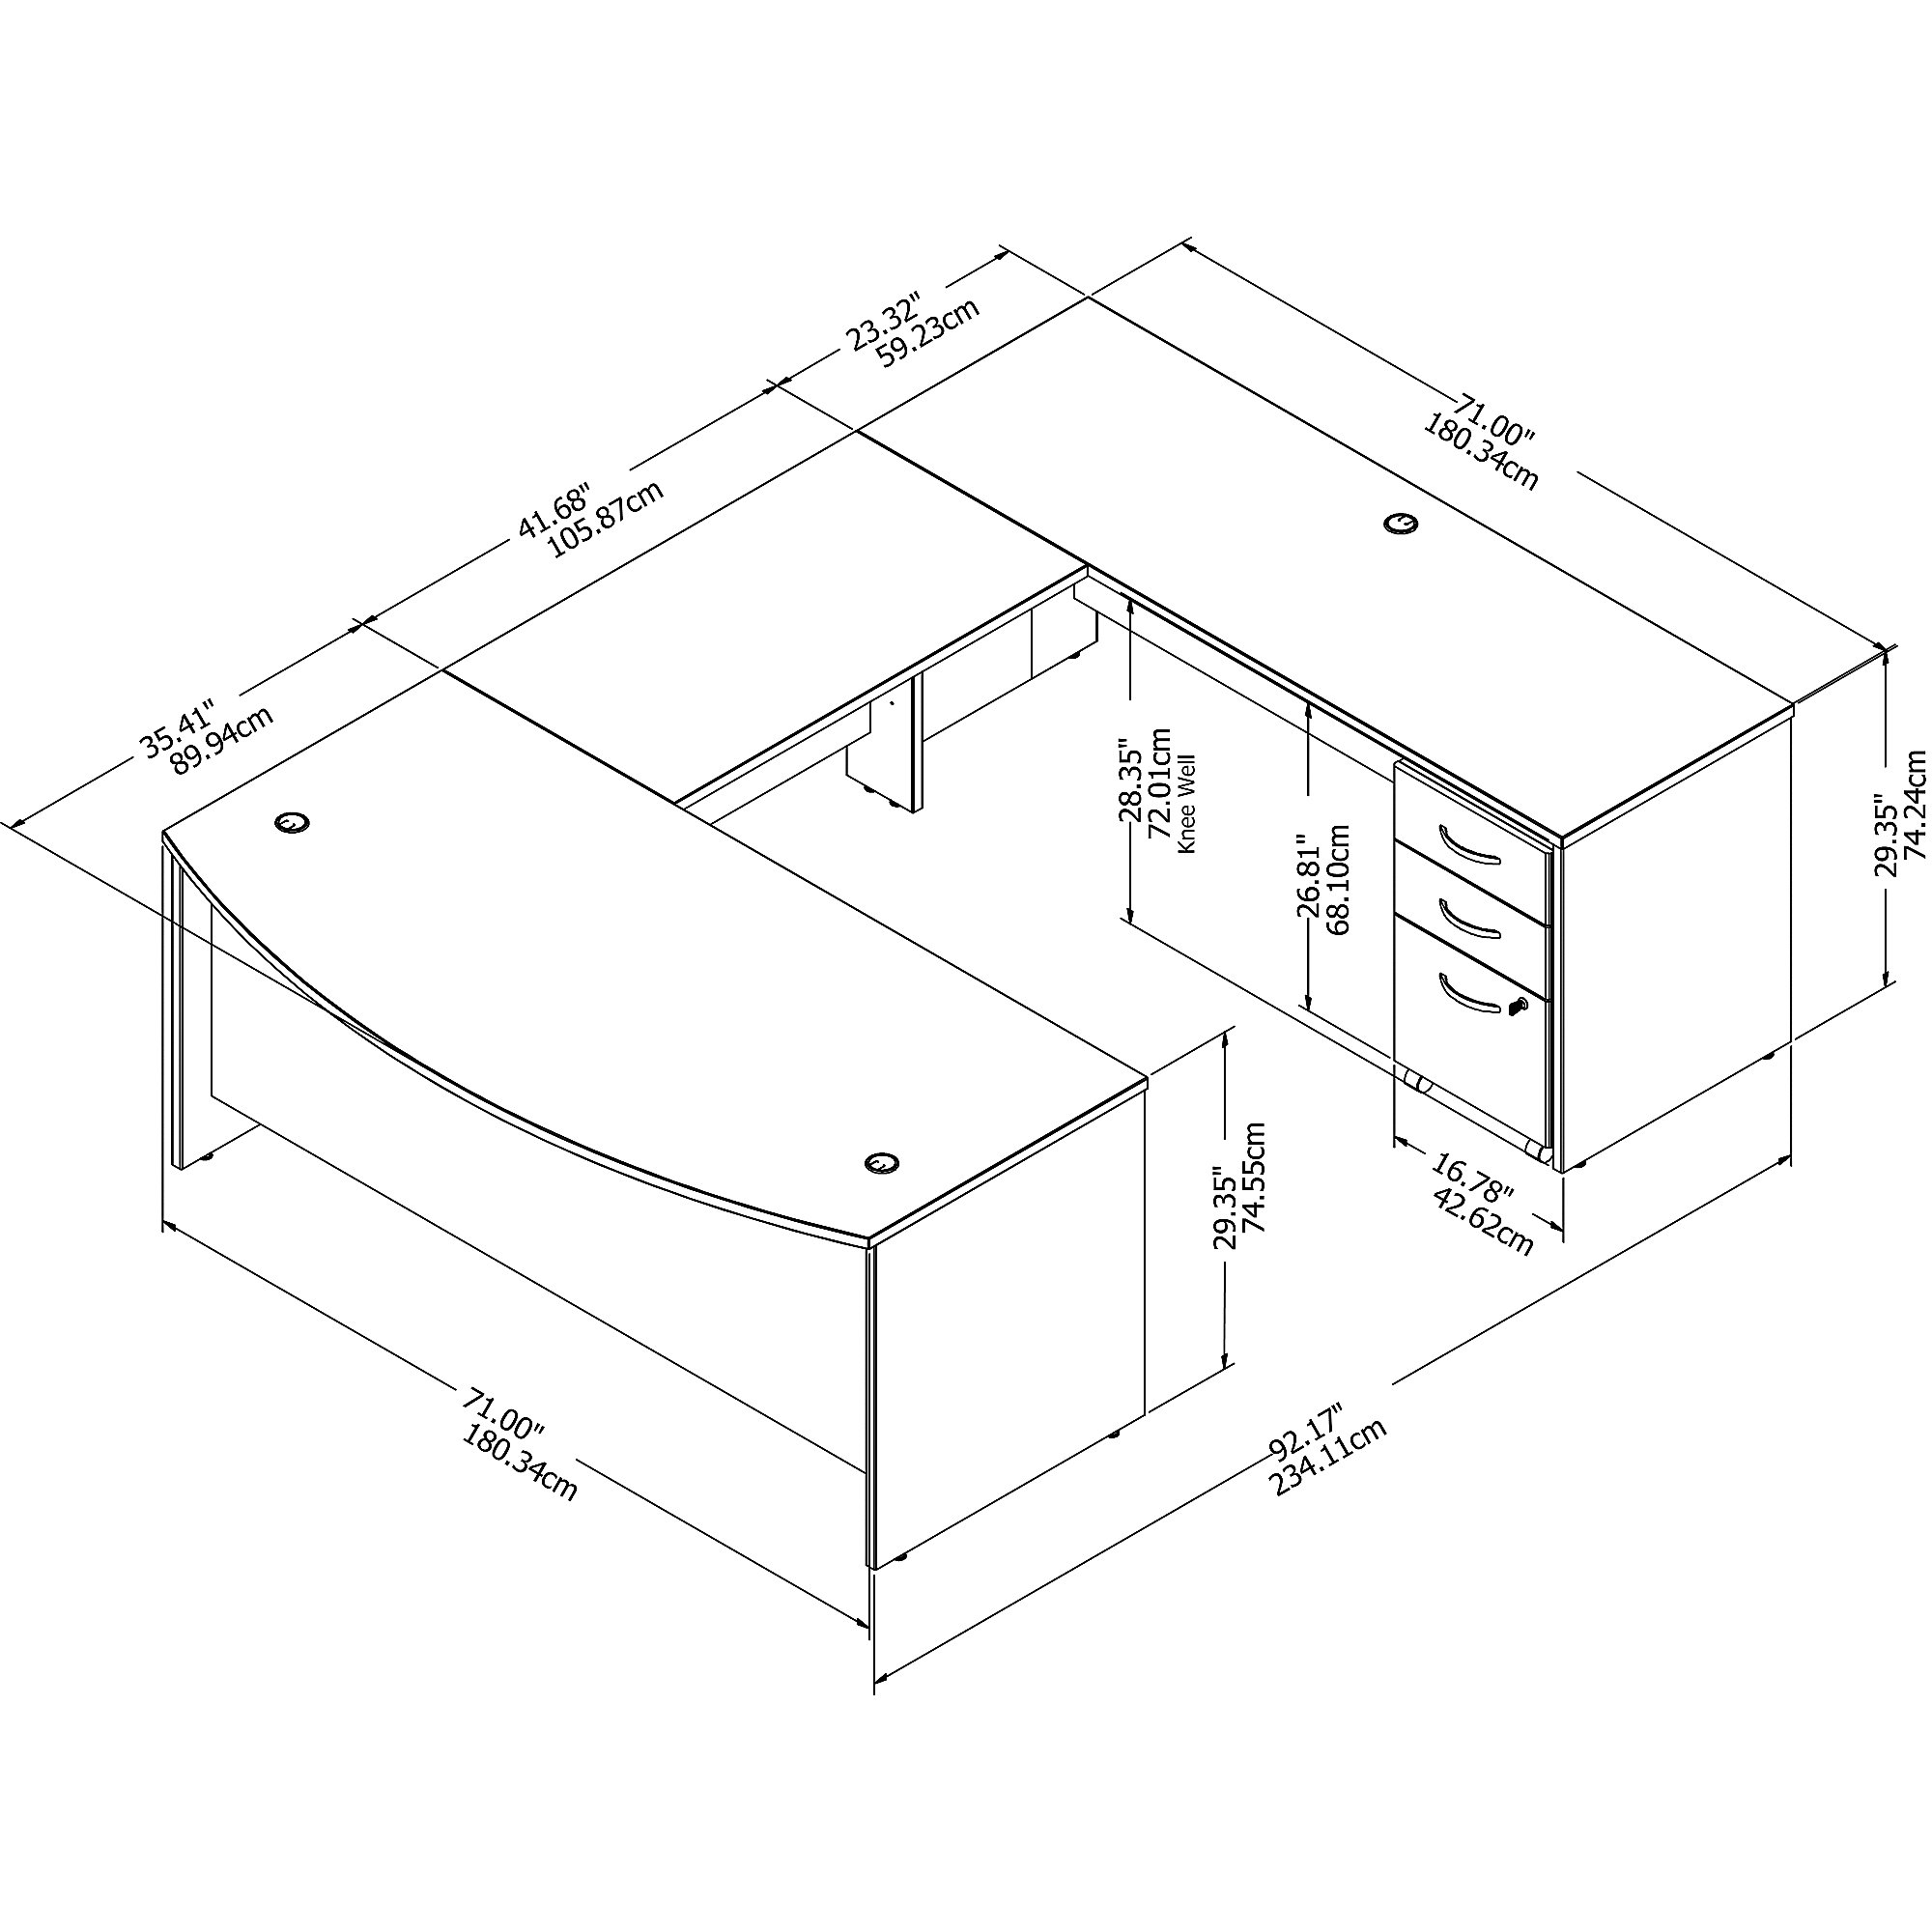 Bush Studio C STC004 U-Shaped Office Desk with Mobile File Cabinet